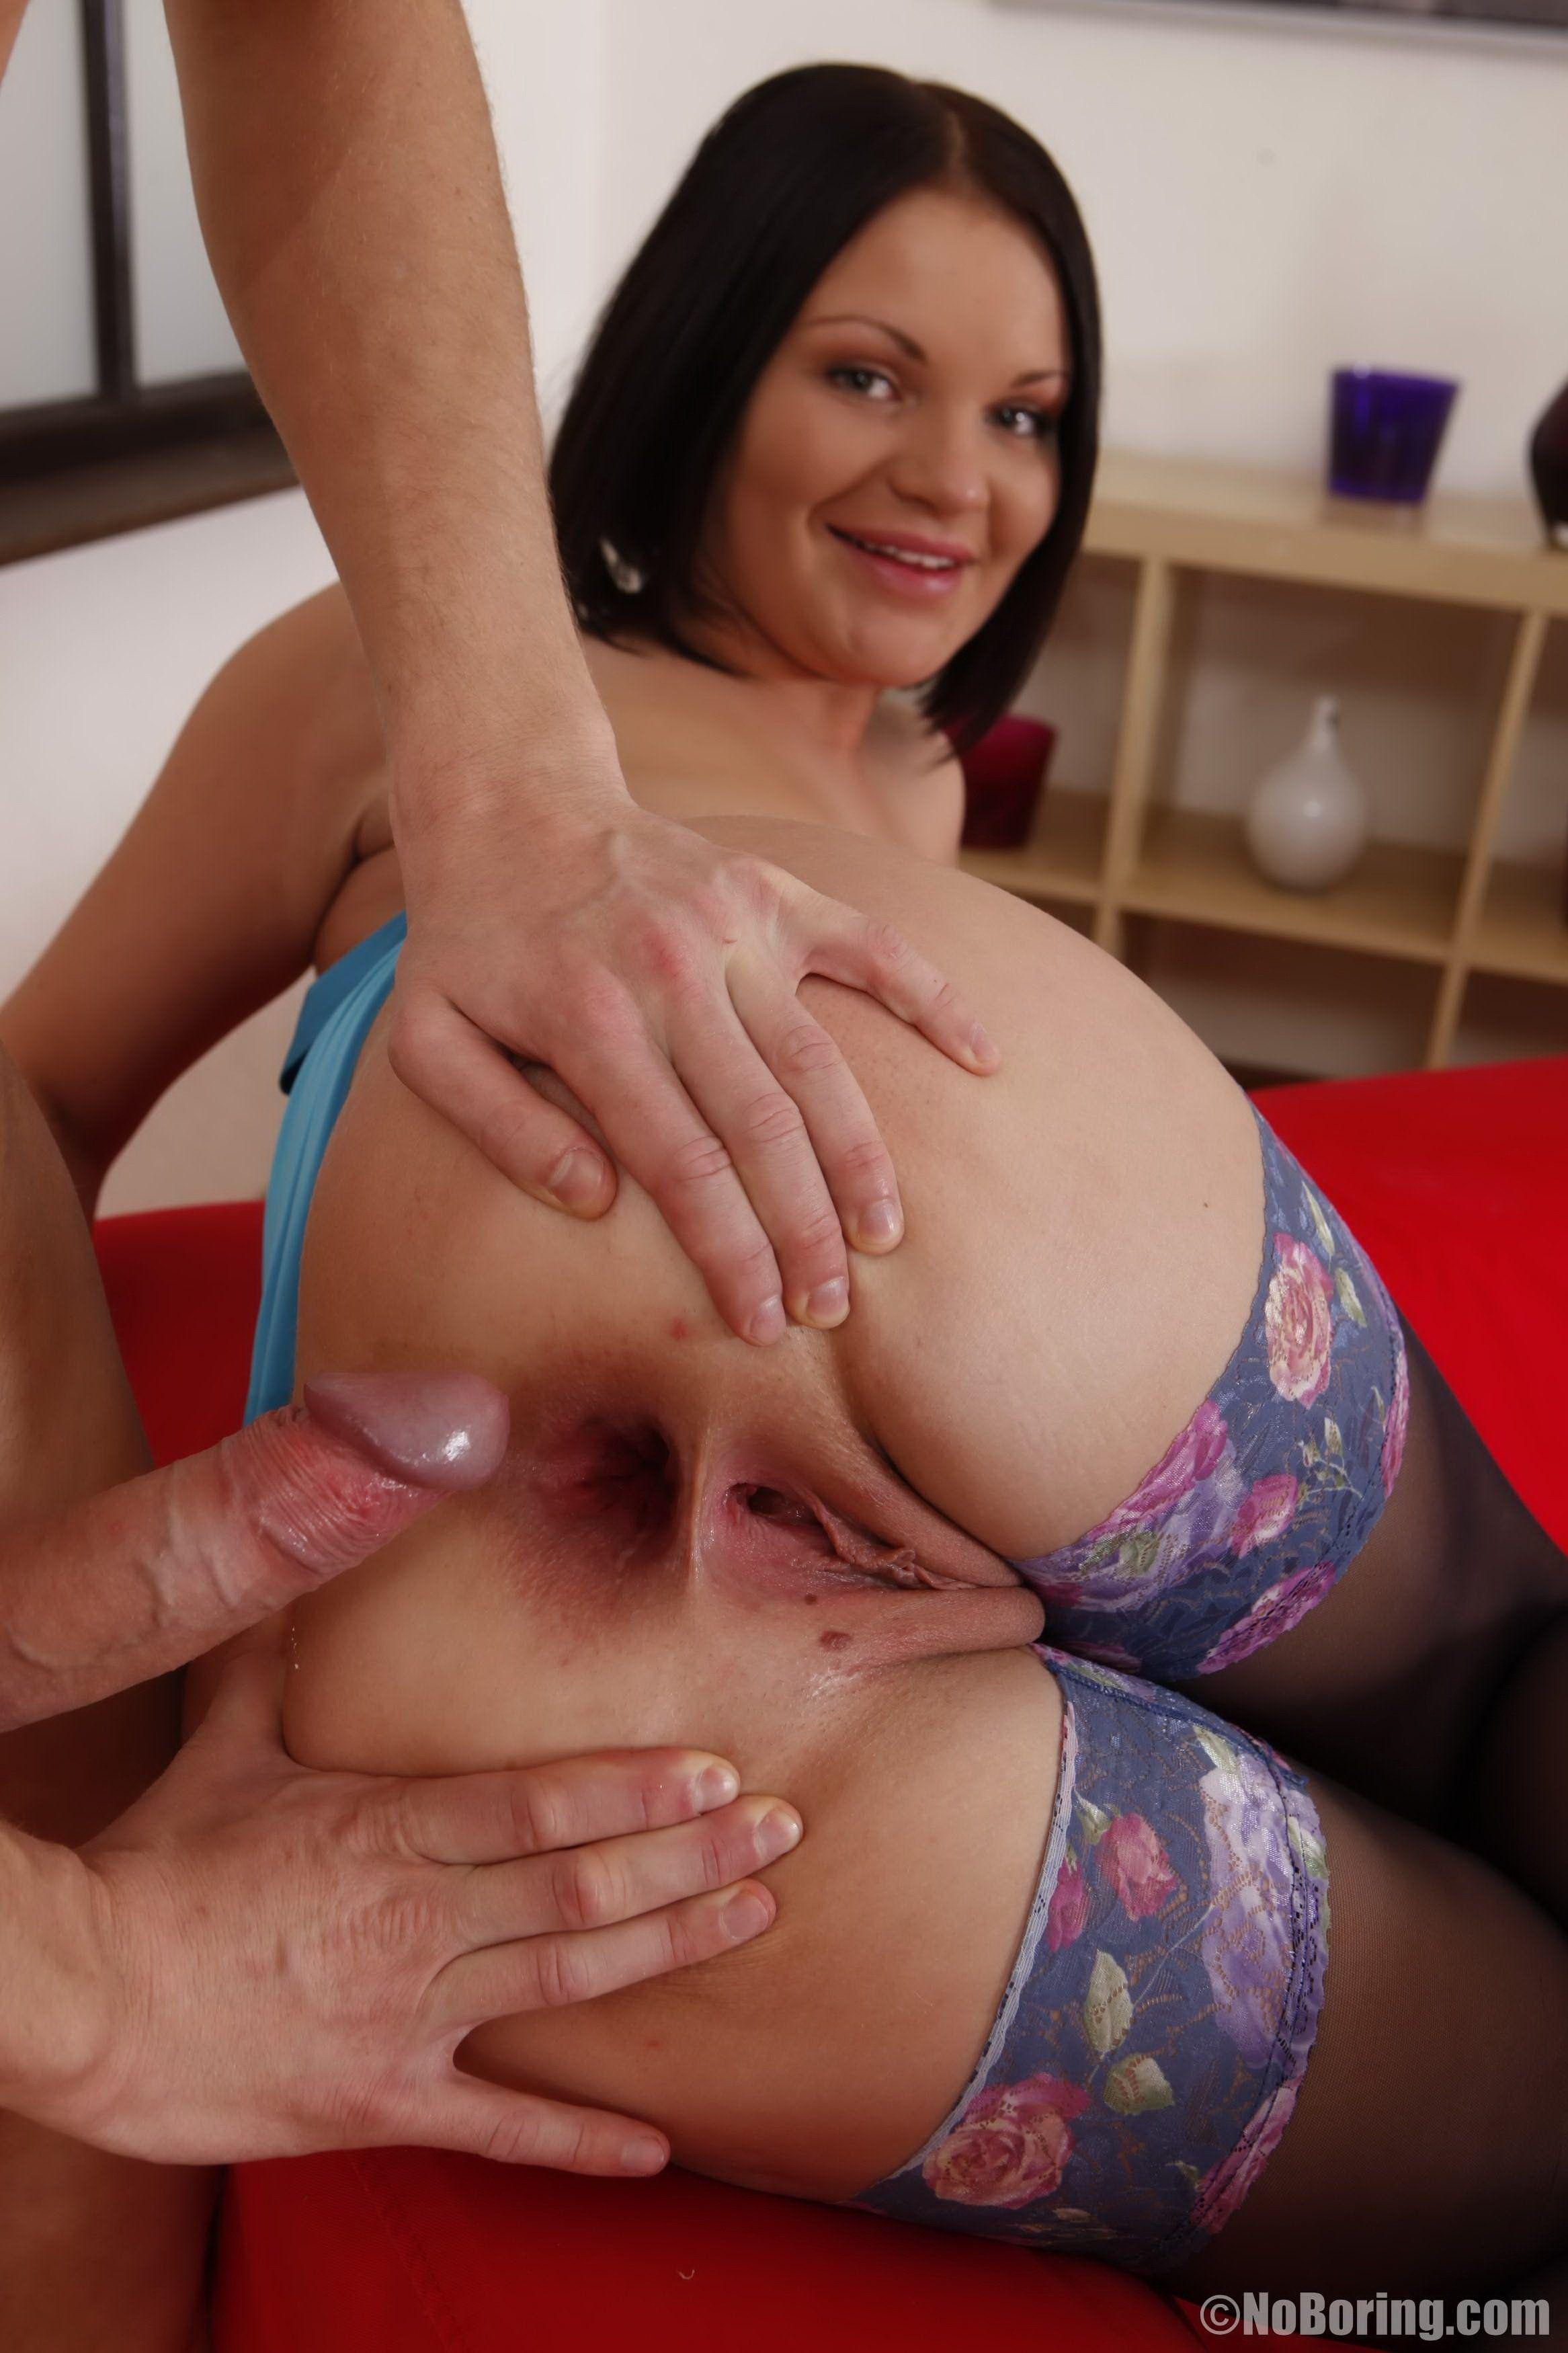 Anal Slut Porn hot ebony anal slut gallety . porn clips.